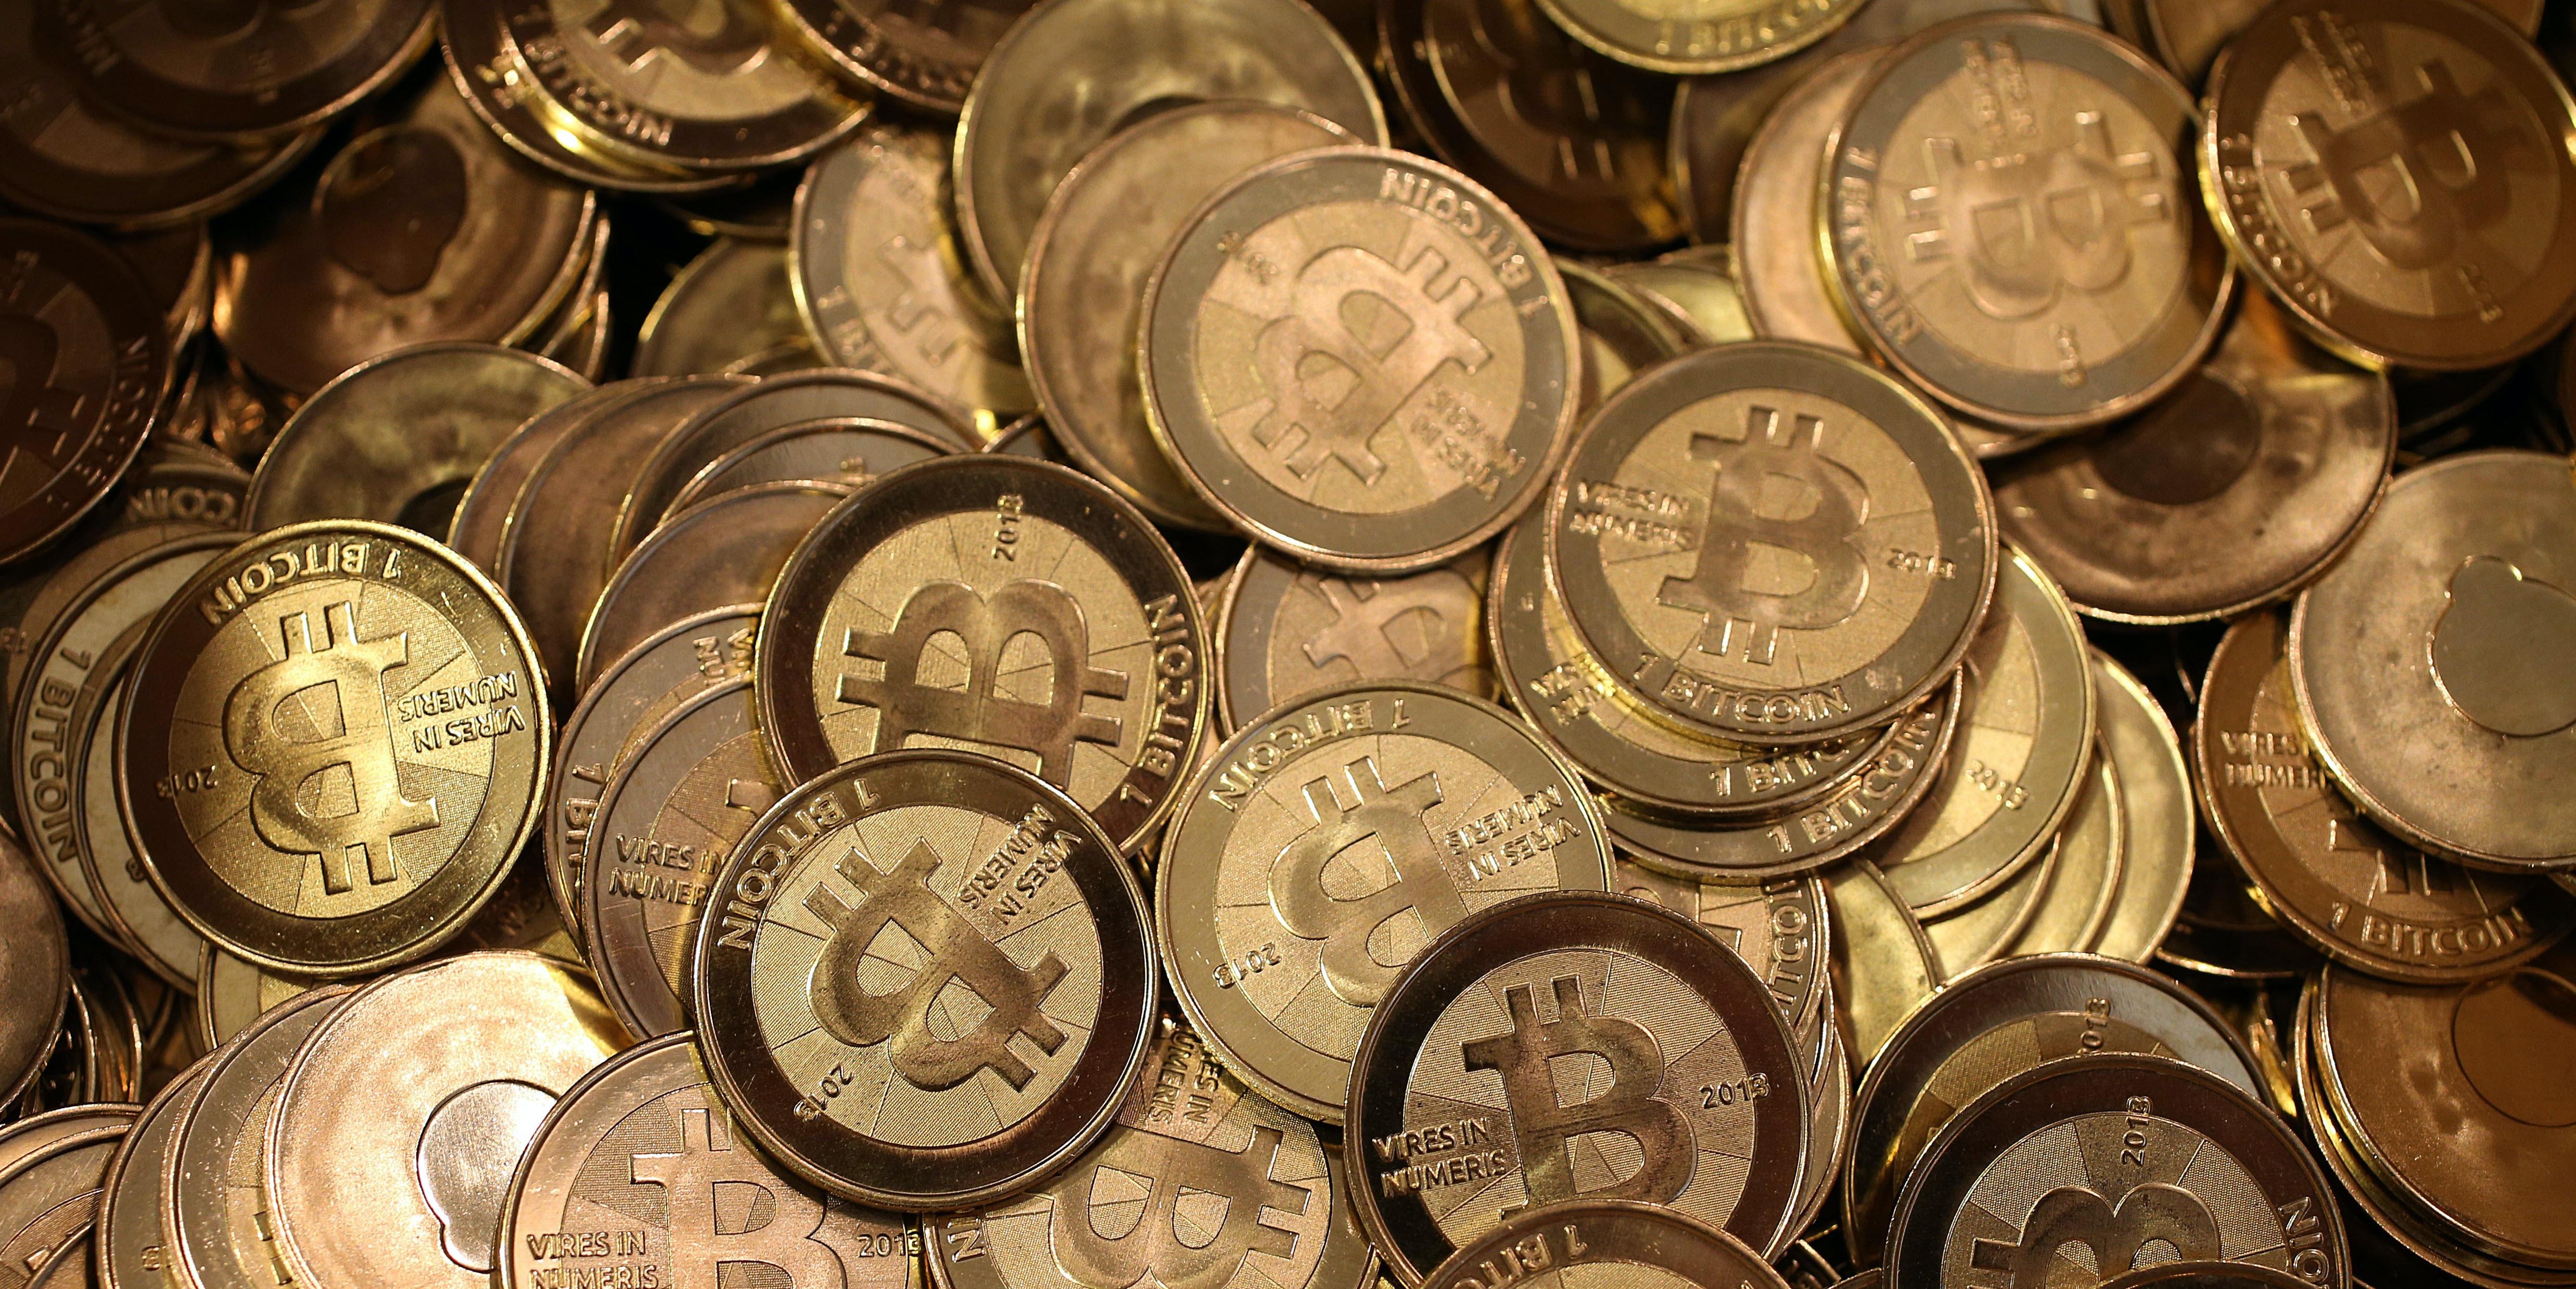 Santander Wants to Digitize Cash With Blockchain